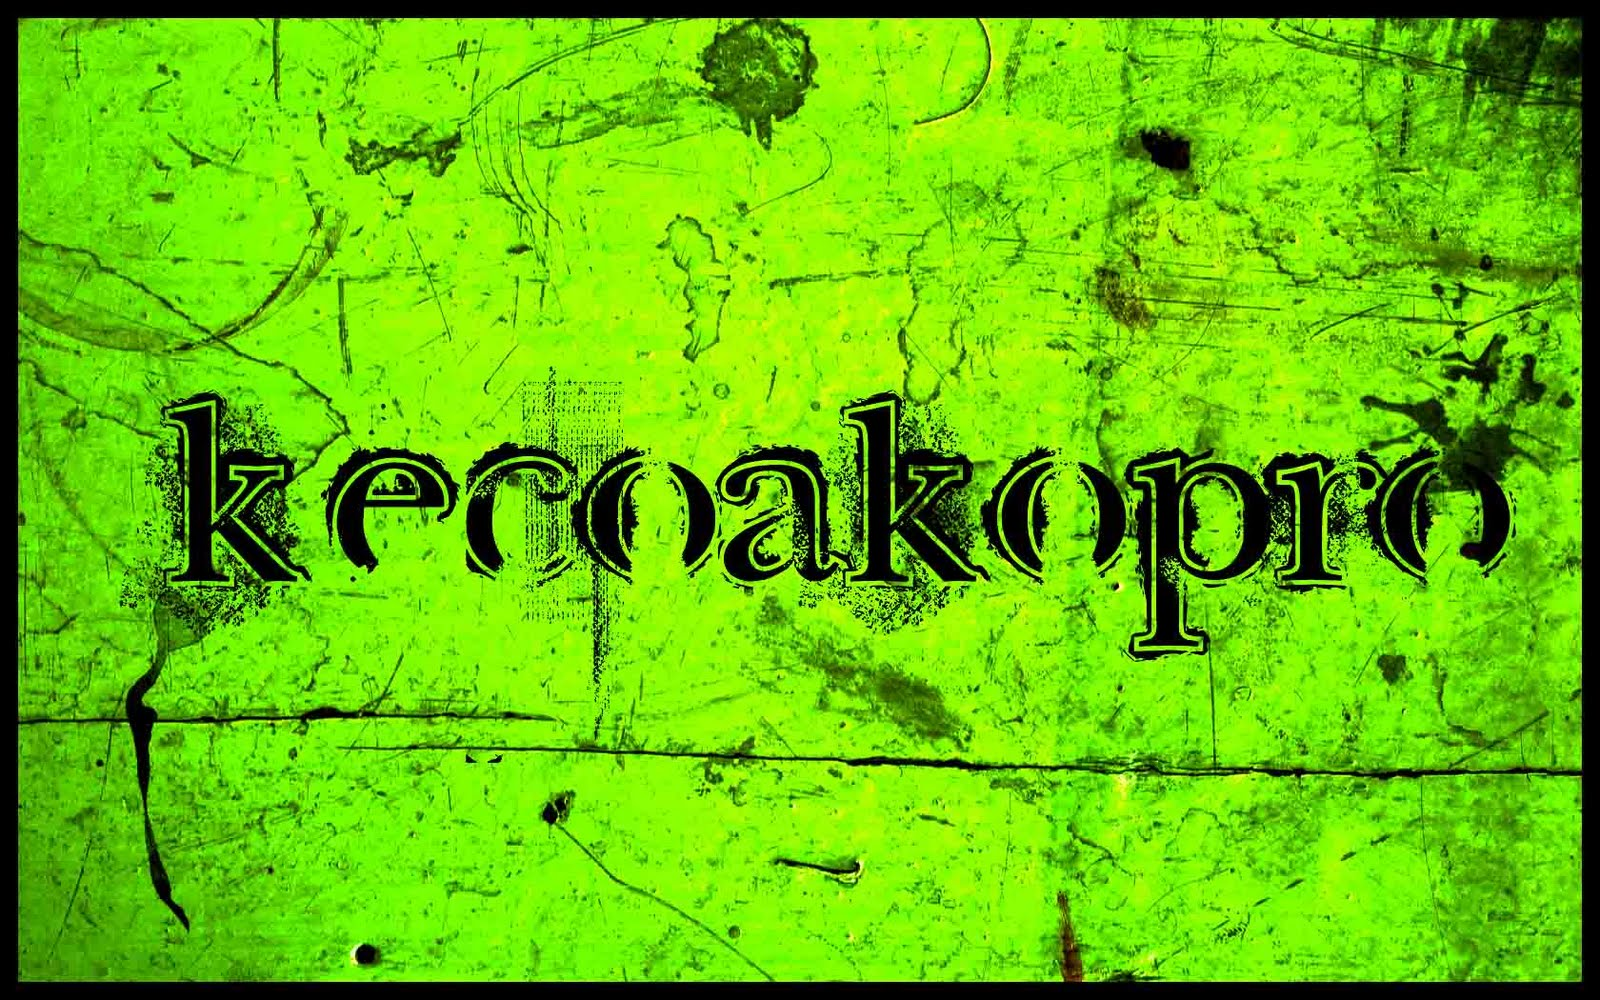 Dari Diari Diare Kecoa Kopro